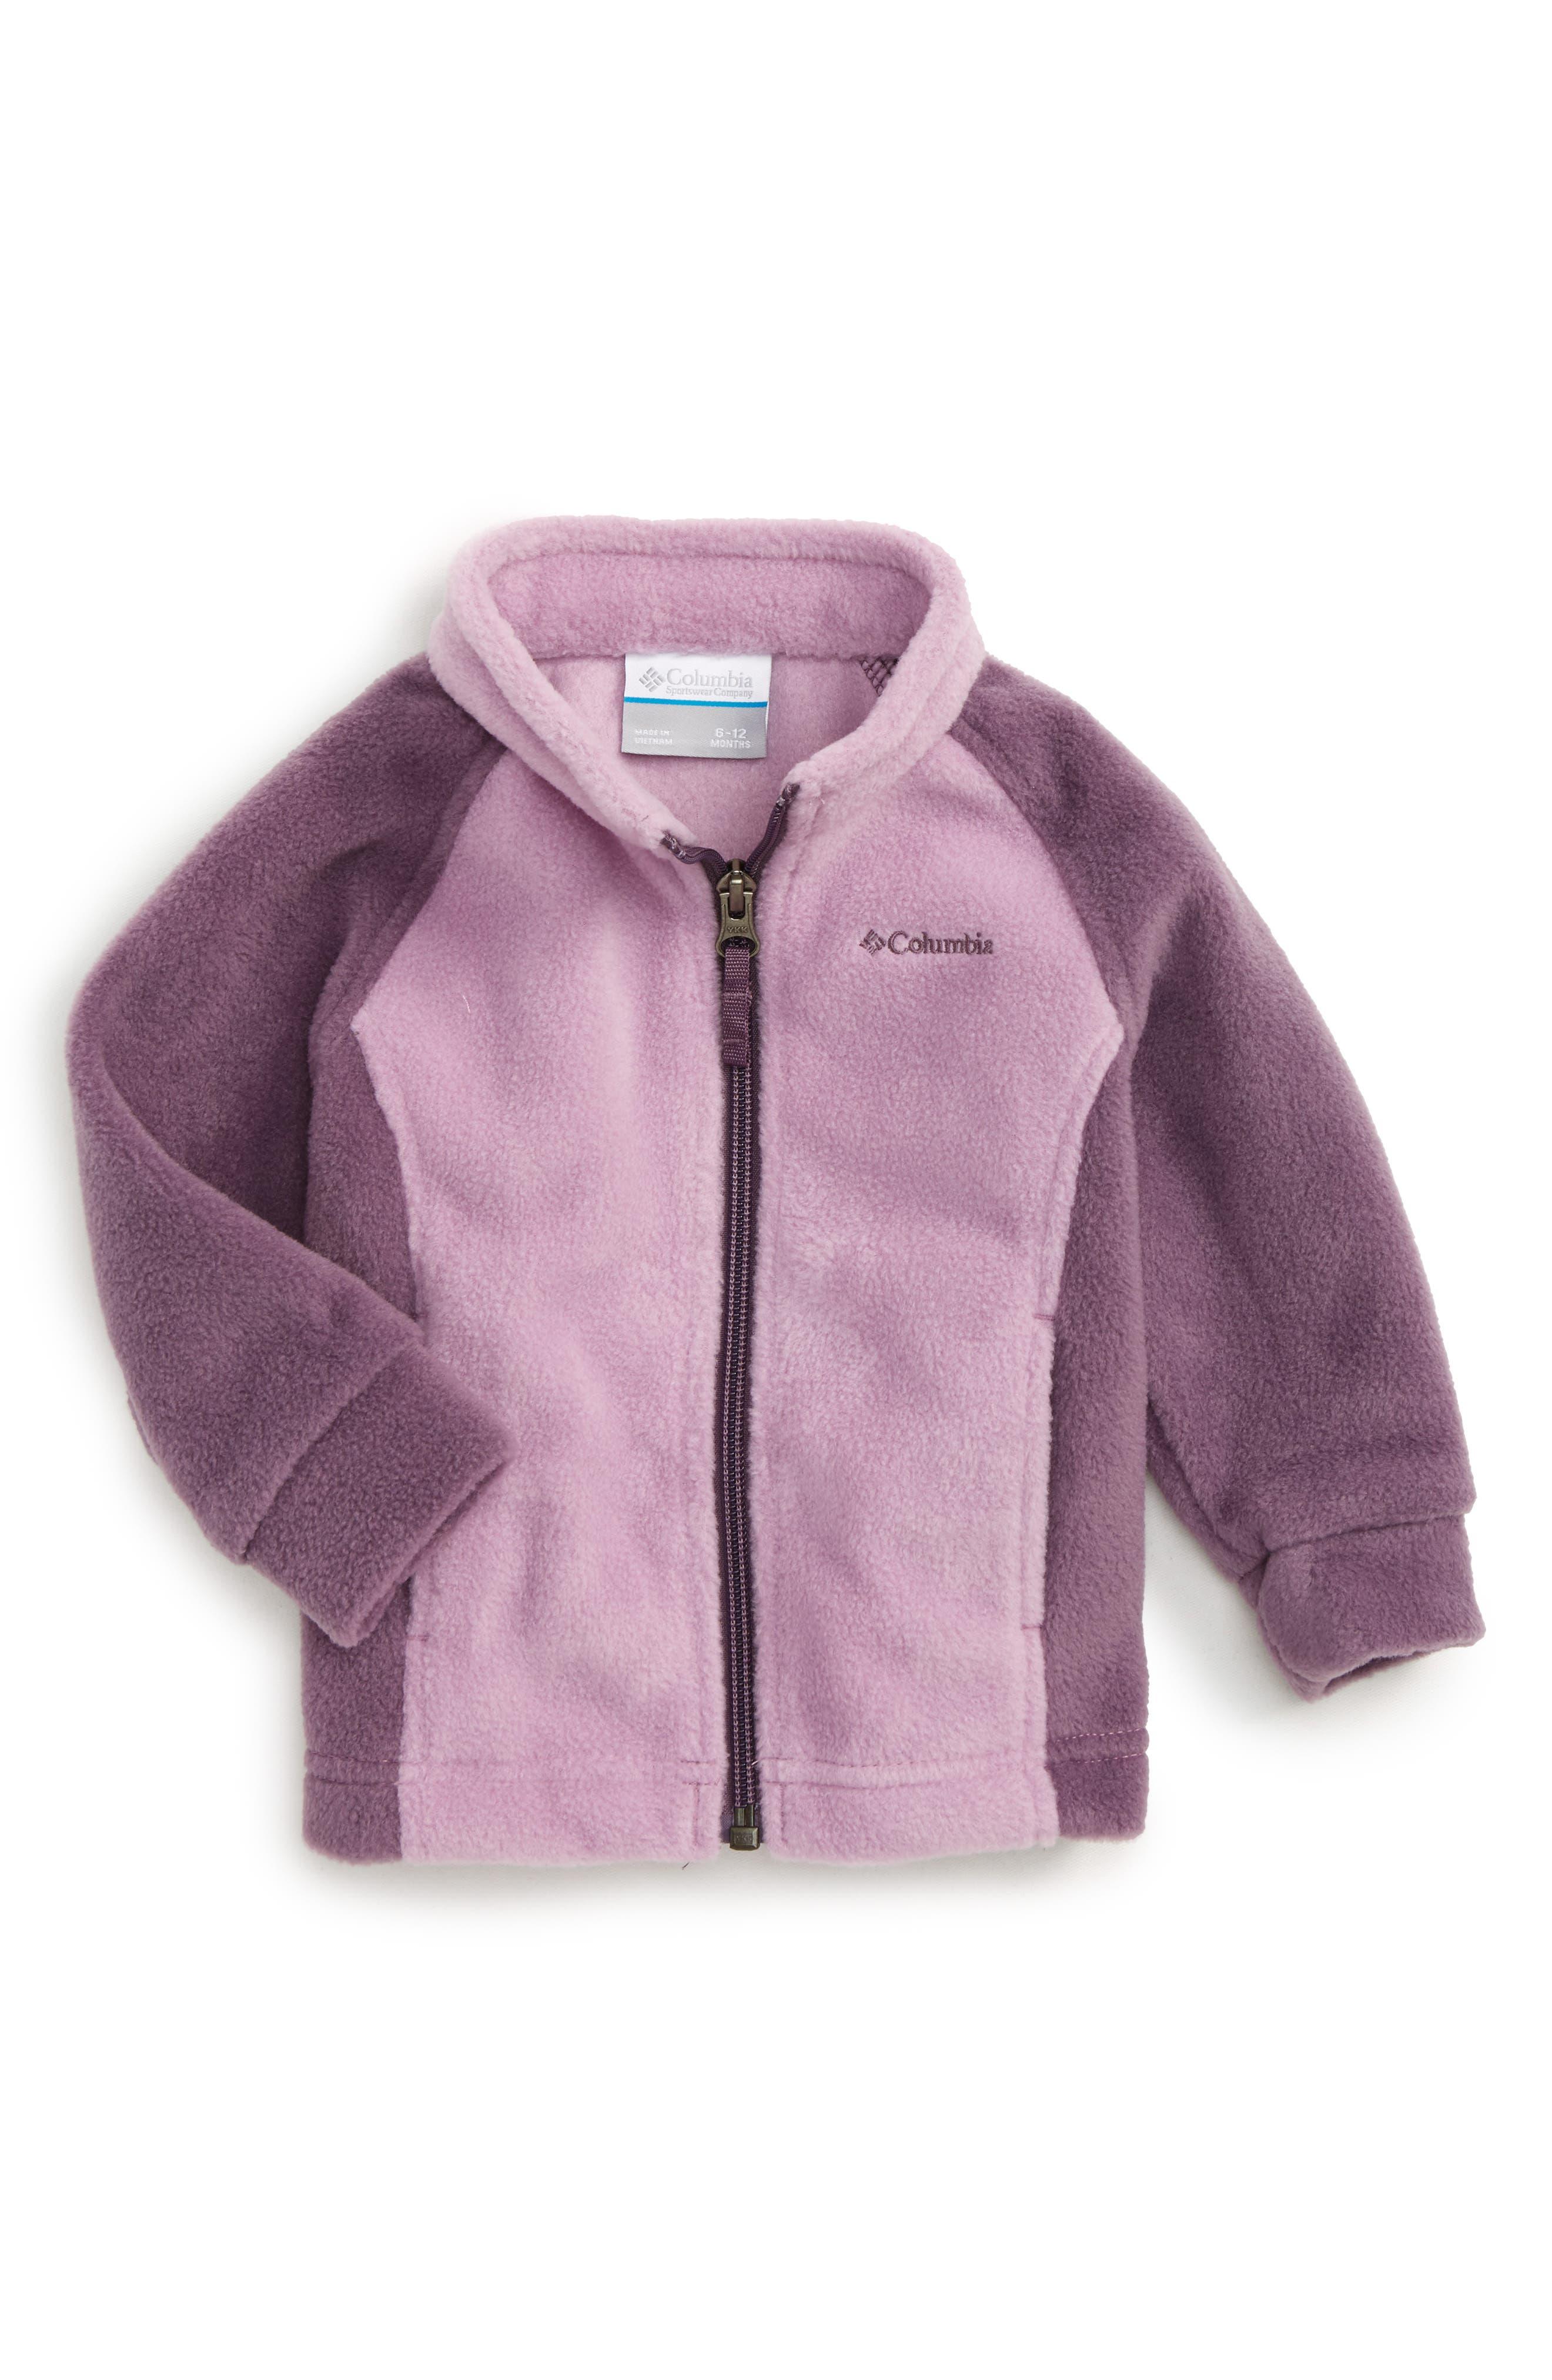 Columbia Benton Springs Fleece Jacket (Baby Girls)